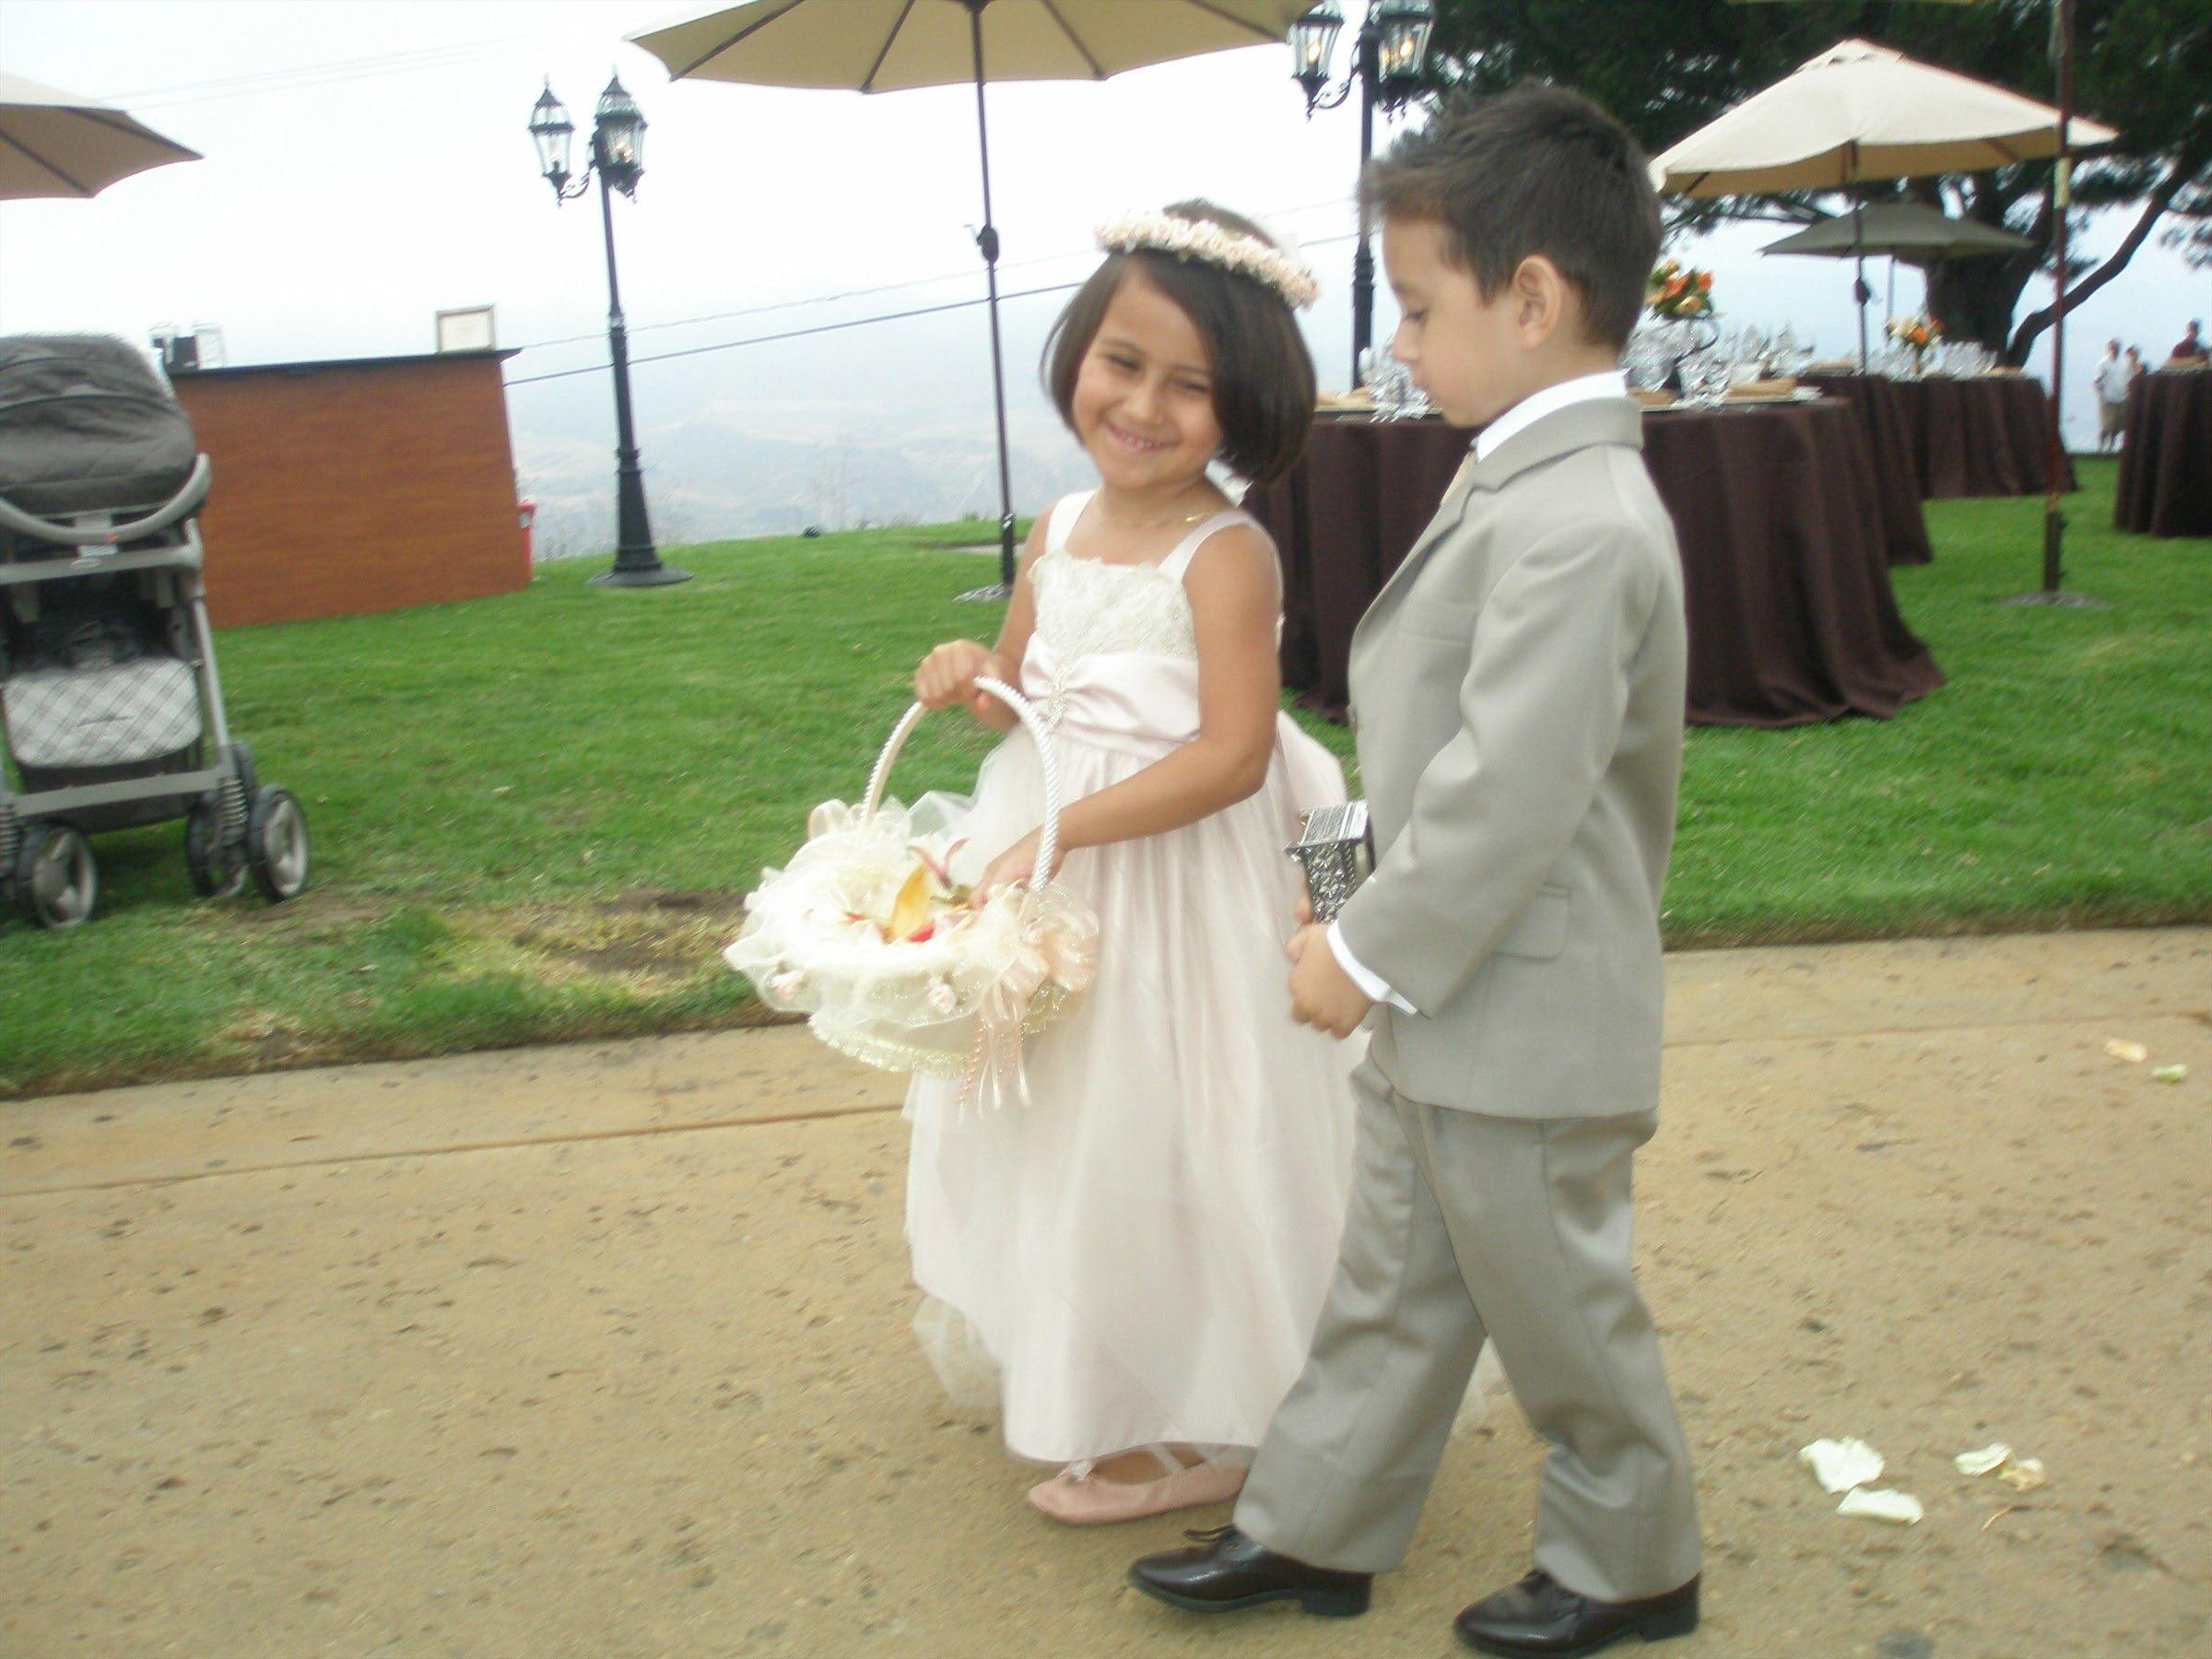 Traditional Spanish Wedding Ceremony By Padre Tomas Burgos Of Www John316weddin